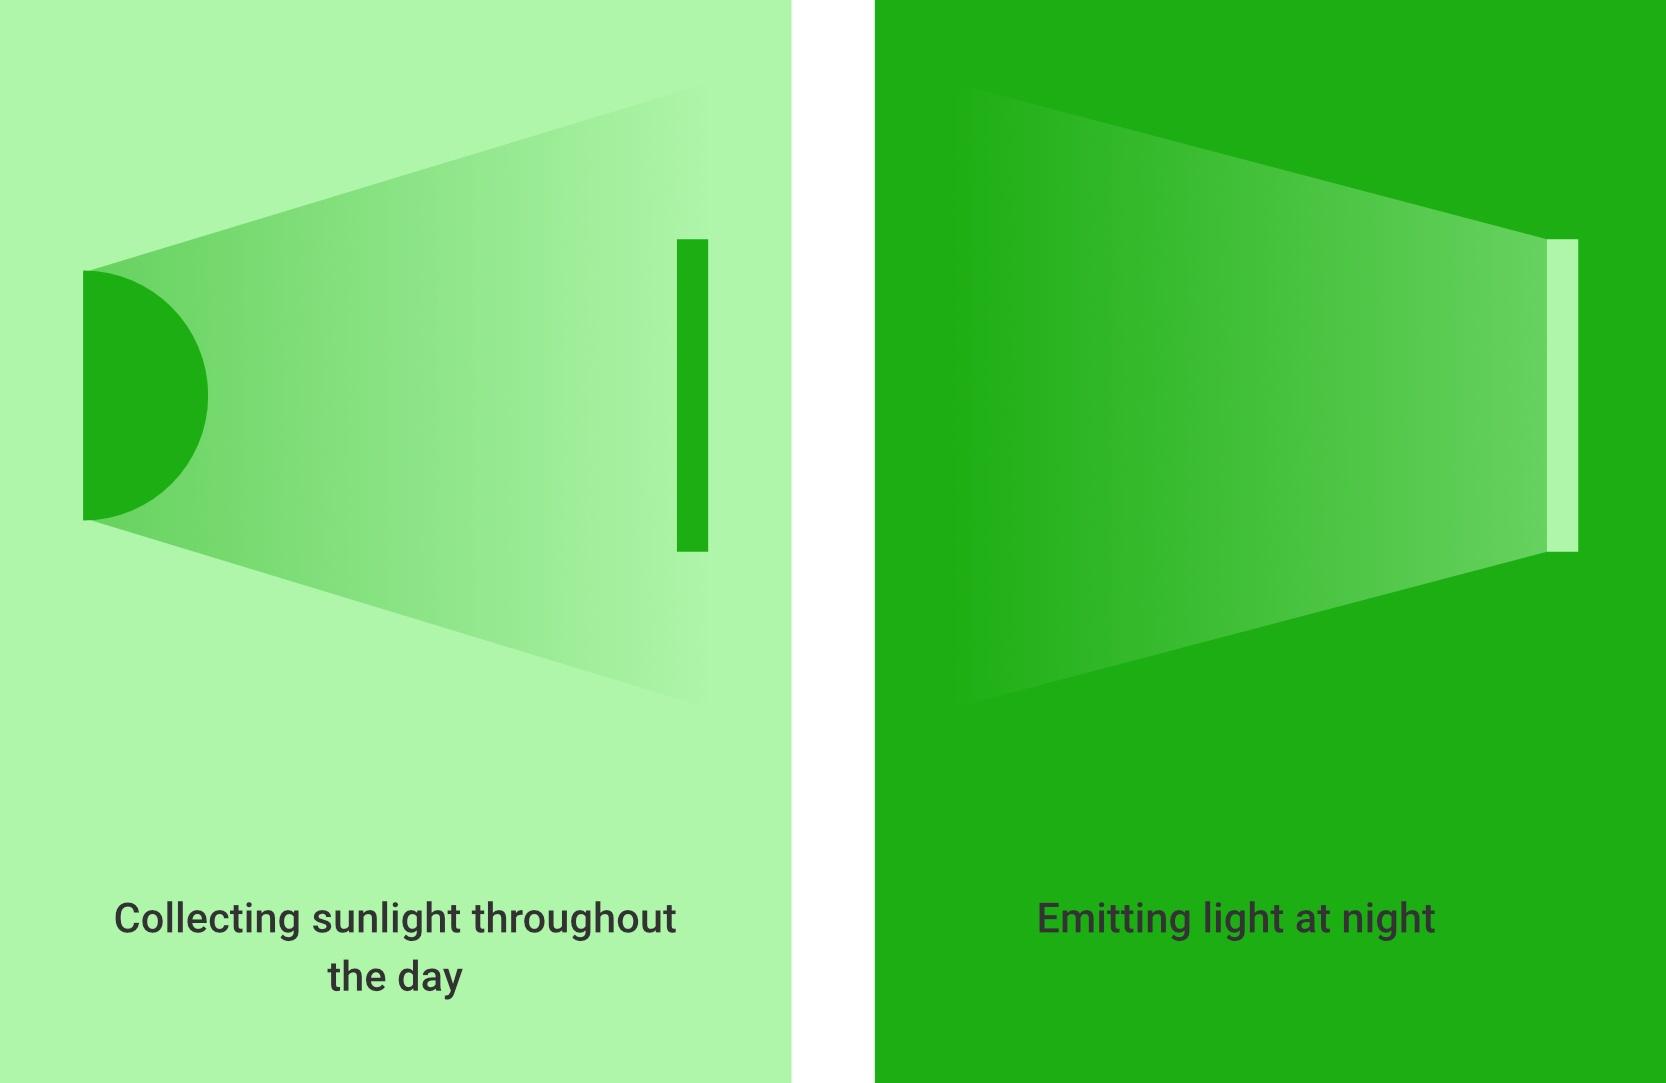 Phosphorescence illustration